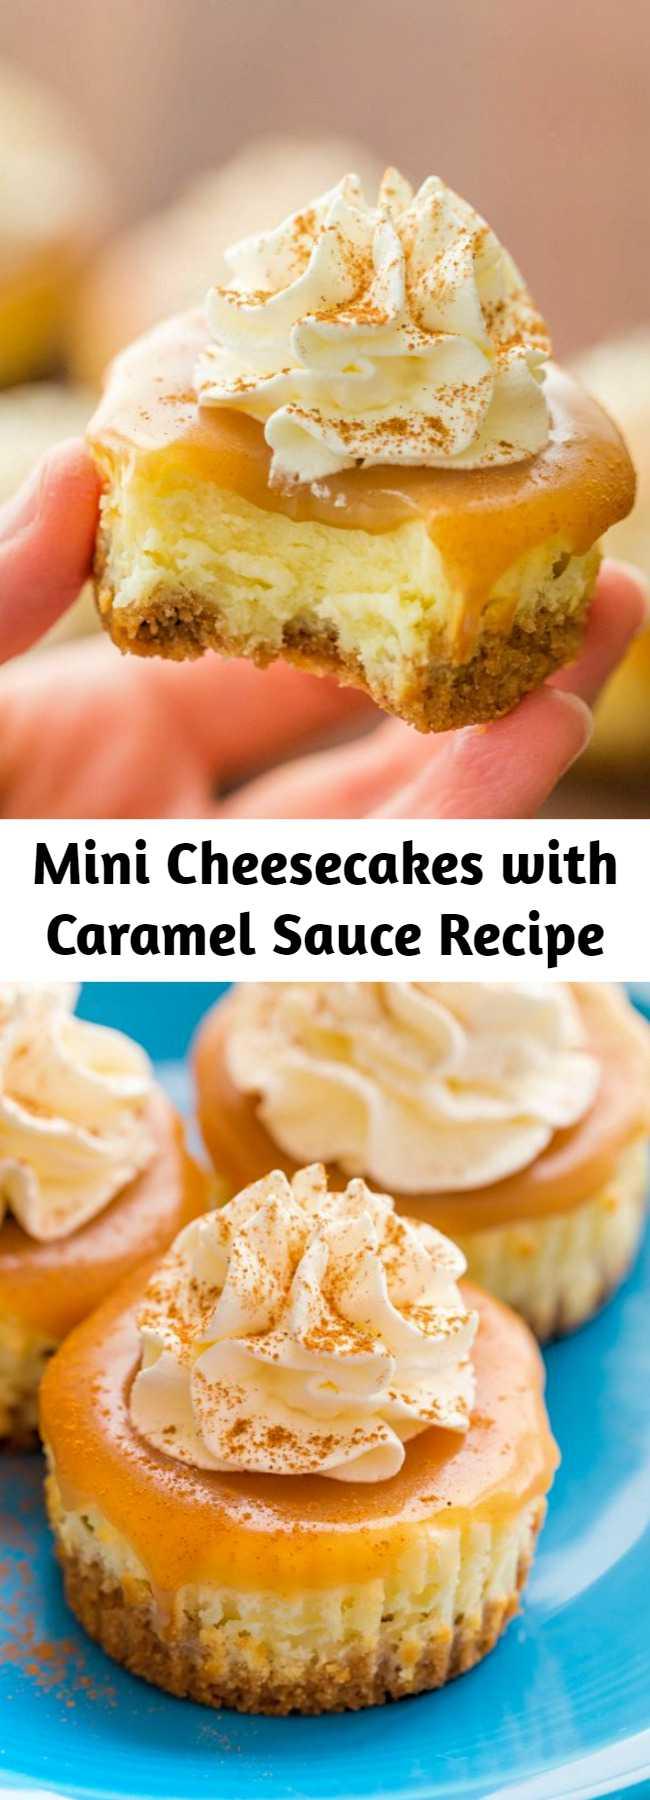 Mini Cheesecakes with Caramel Sauce Recipe